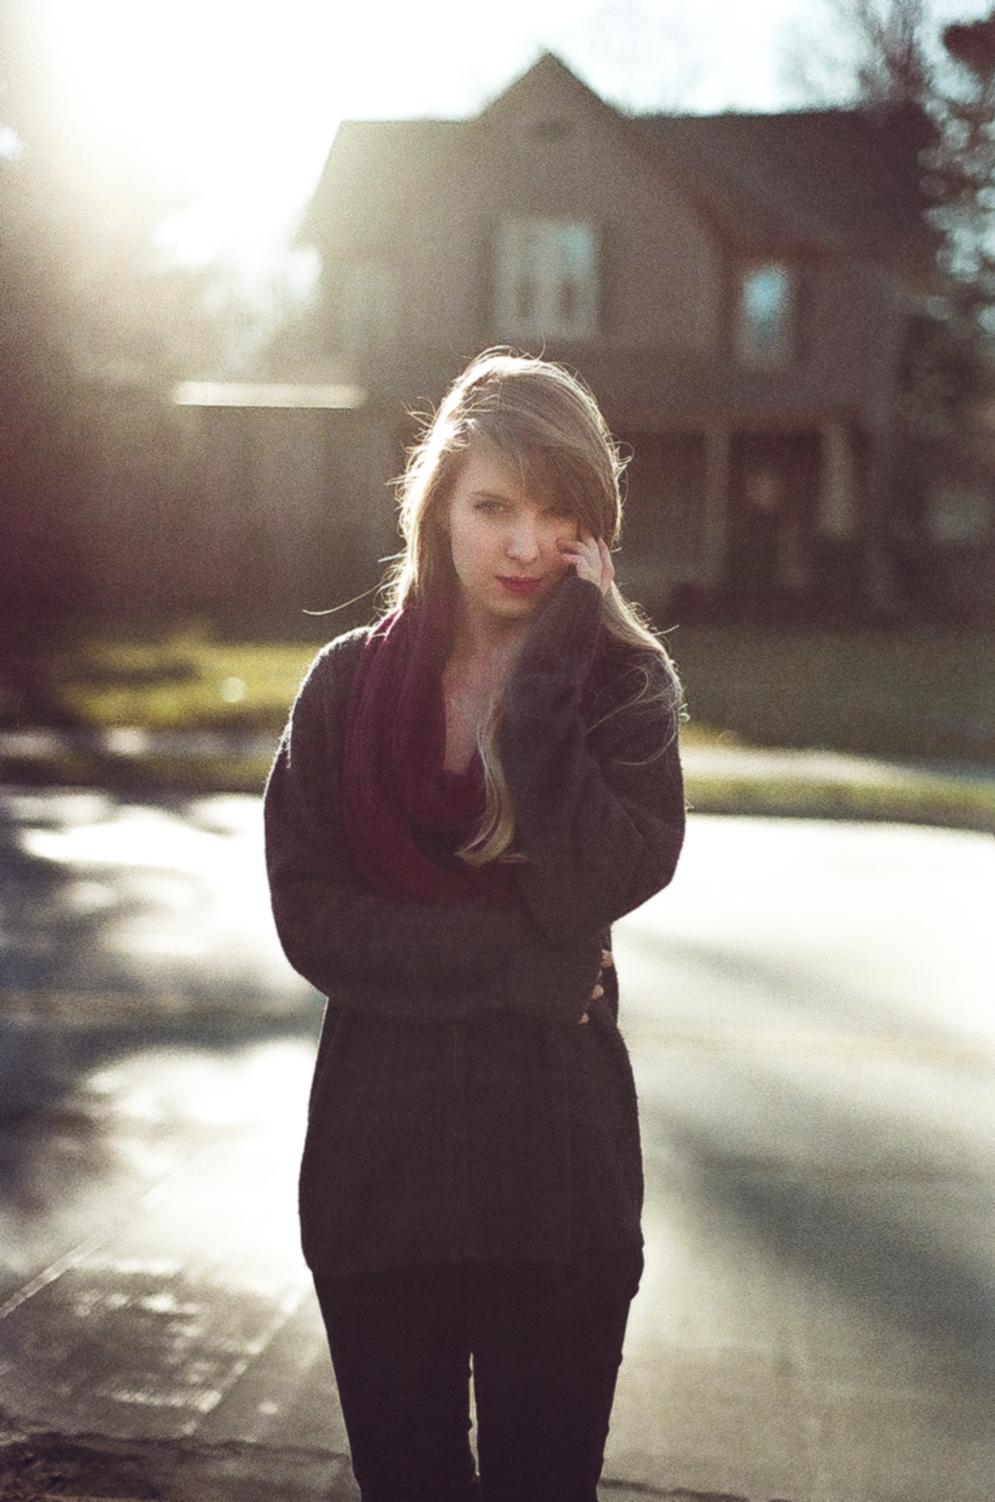 Emily Wilson Photography film camera Pentax 50 mm aged film Tori Trout Urbana Illinois